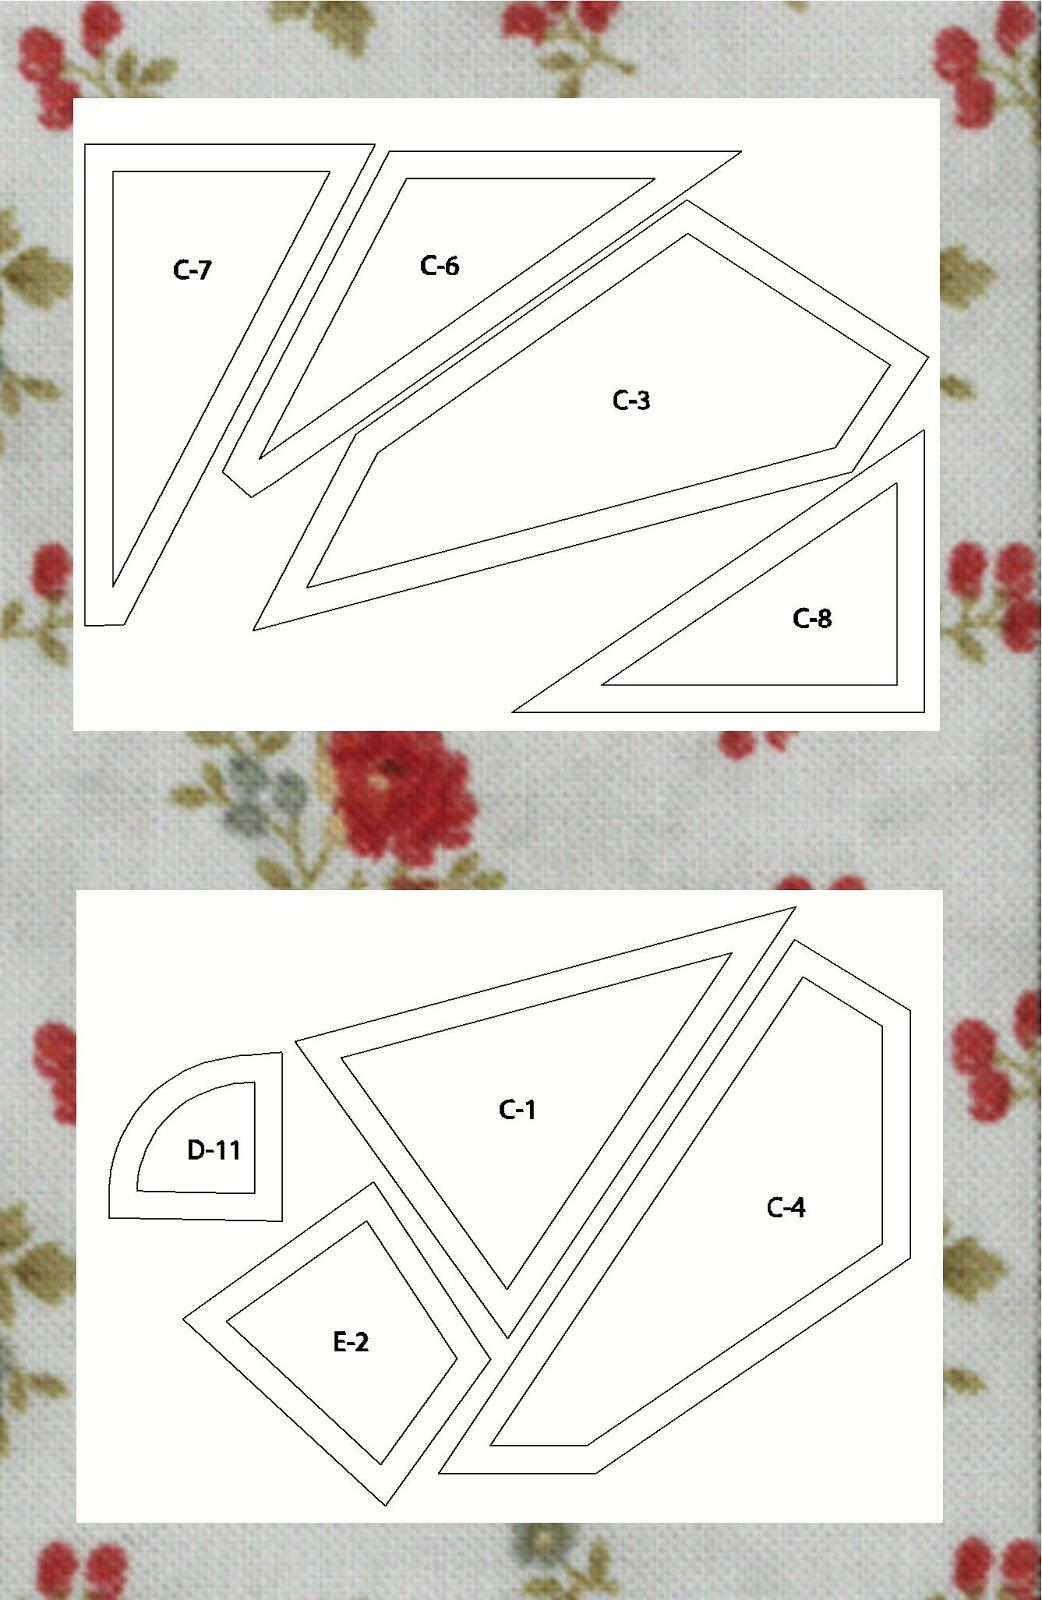 Free Printable Crazy Quilt Patterns Aplicacion Optimizada Para Internet Explorer 5 5 O Superior C Crazy Quilt Blocks Paper Pieced Quilt Patterns Crazy Quilts